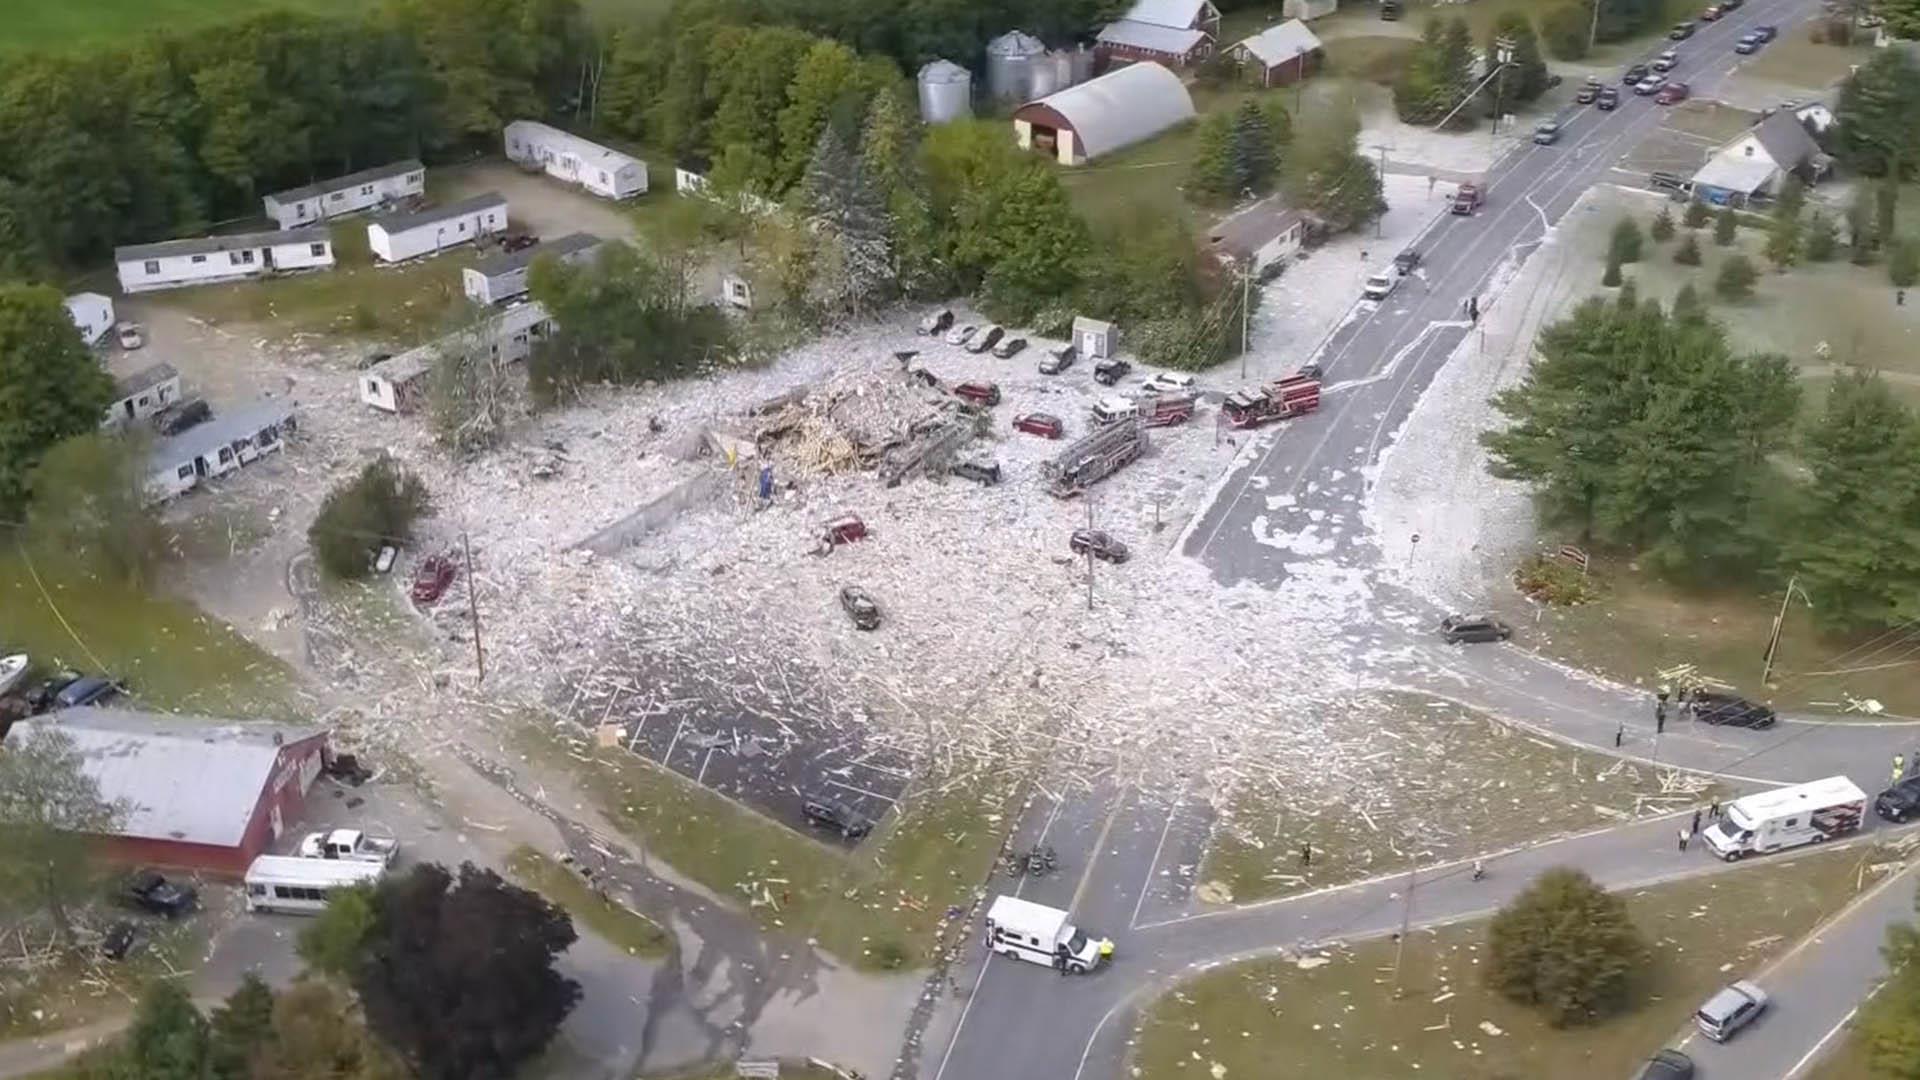 Aerials show 'total devastation' of Maine gas explosion